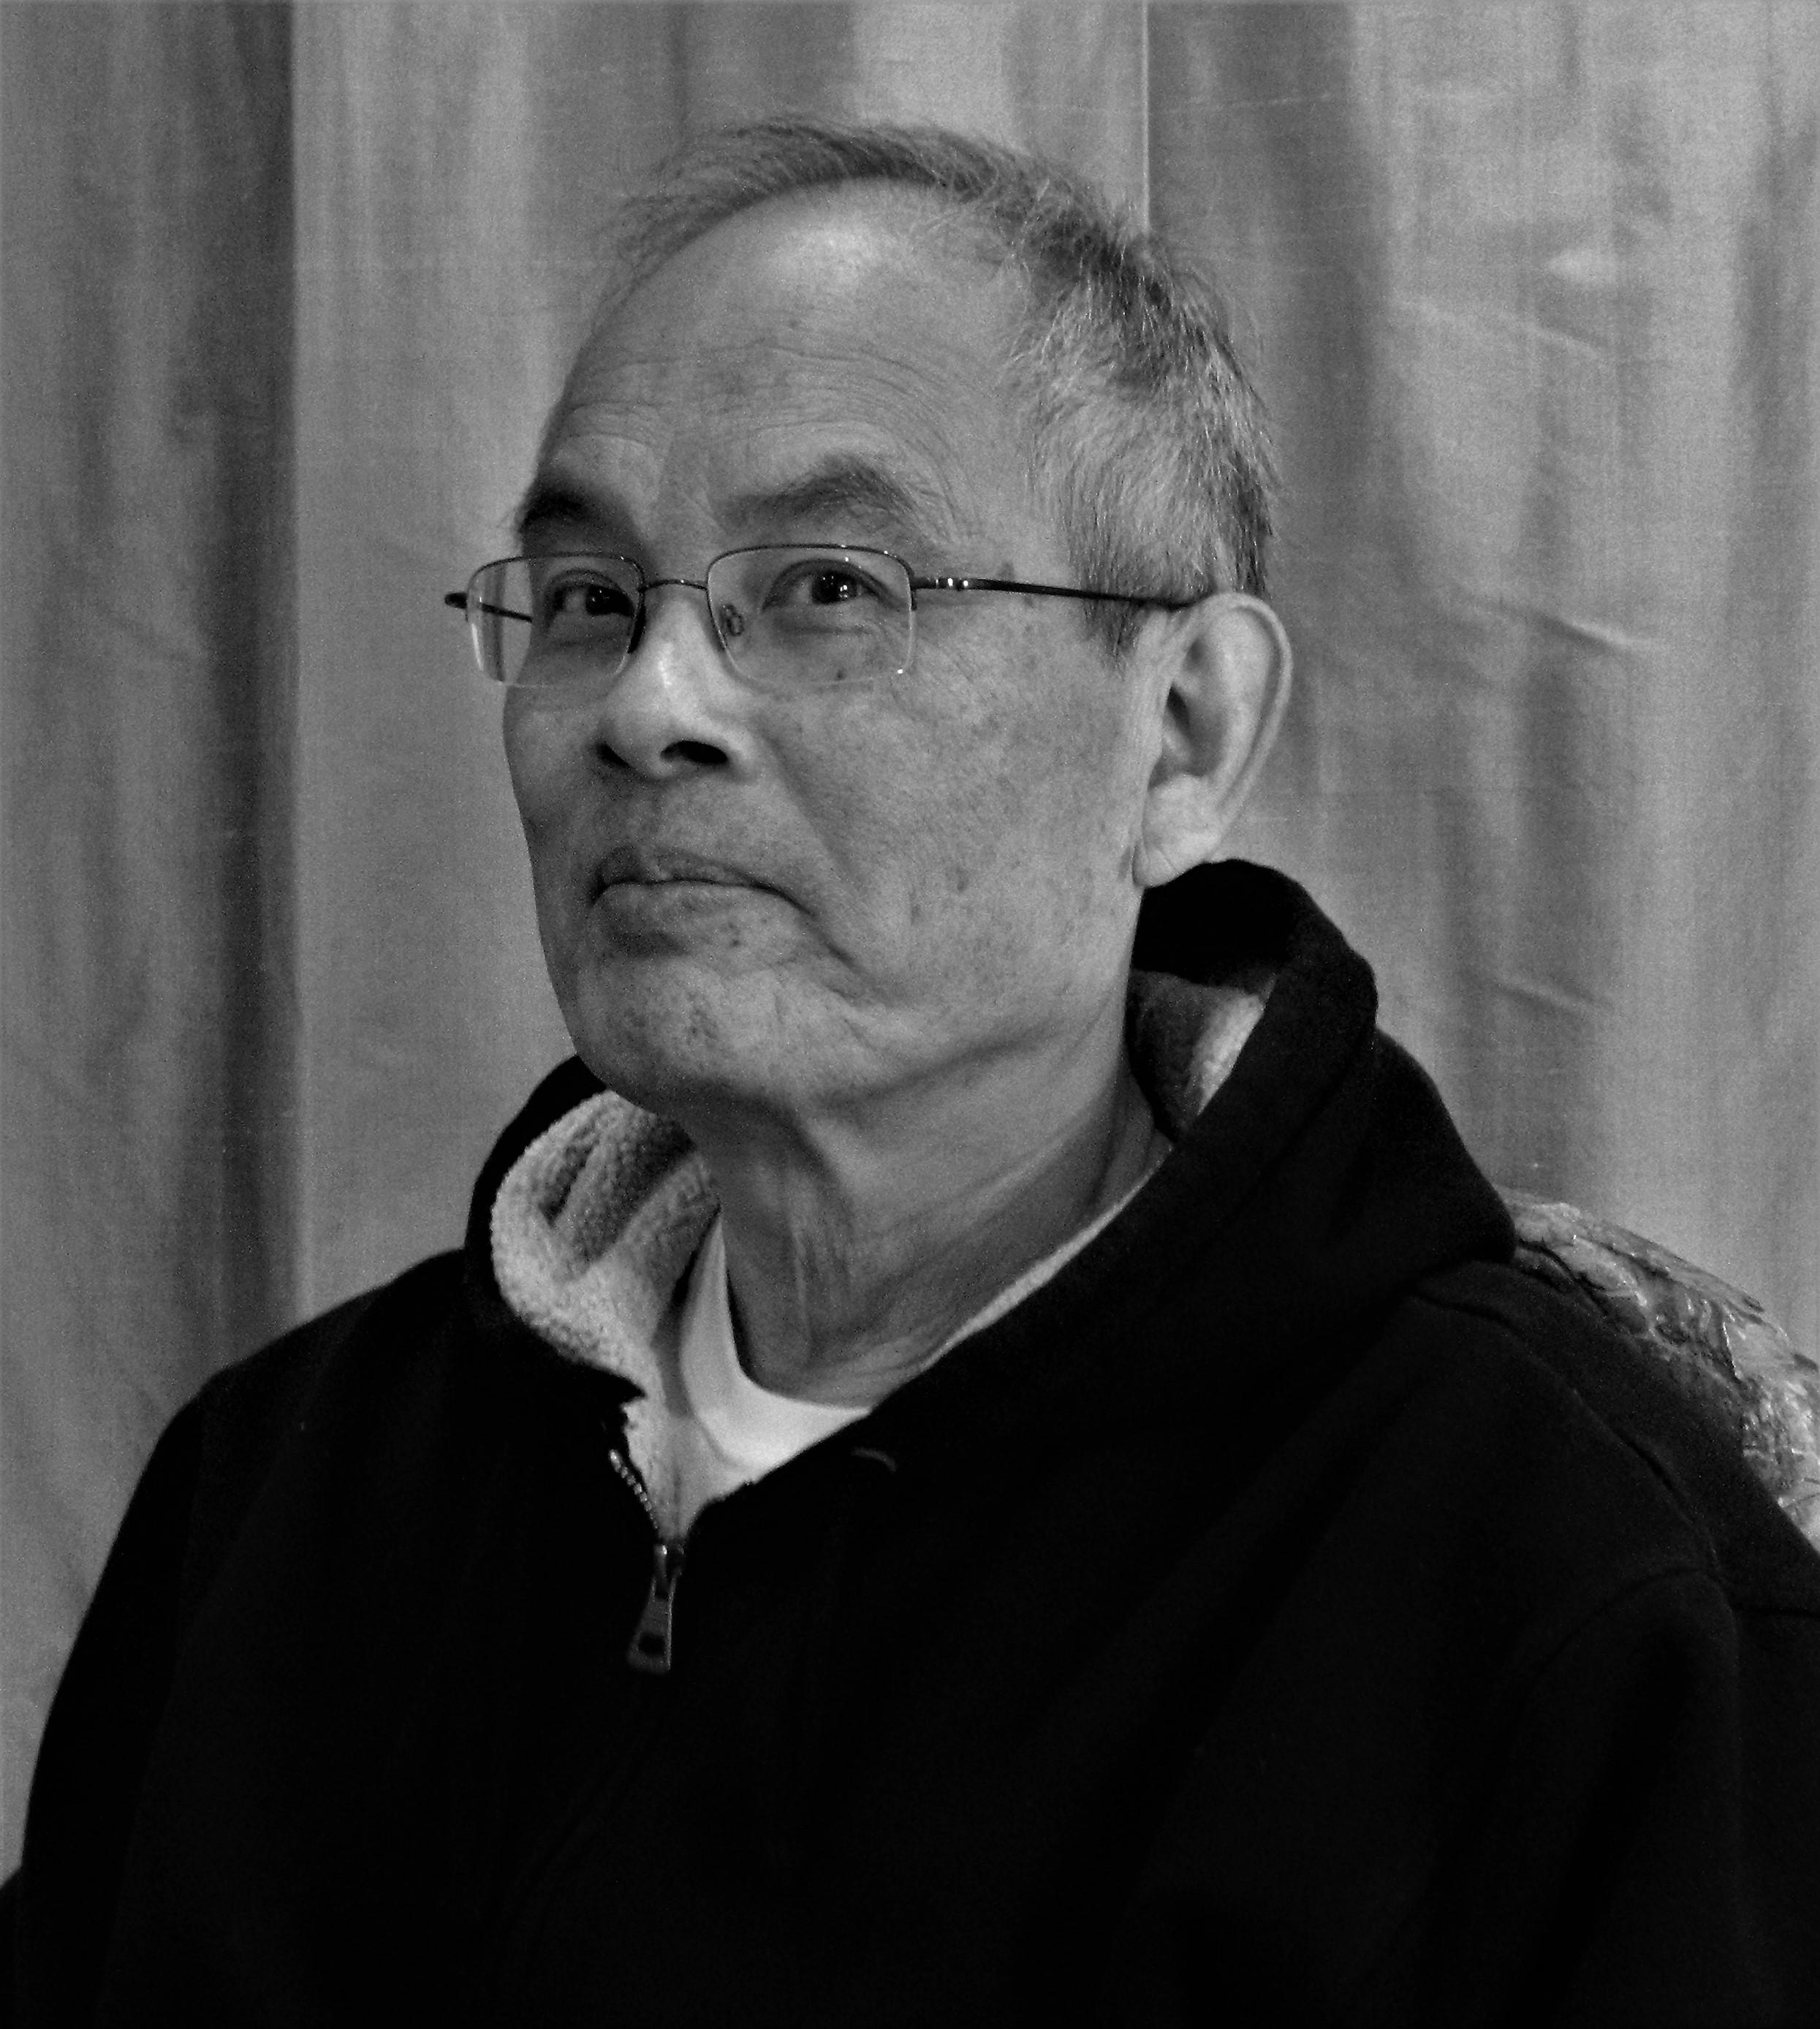 Alan Sue, November 2017. Photo by Keith Bringe. Copyright Rare Nest.